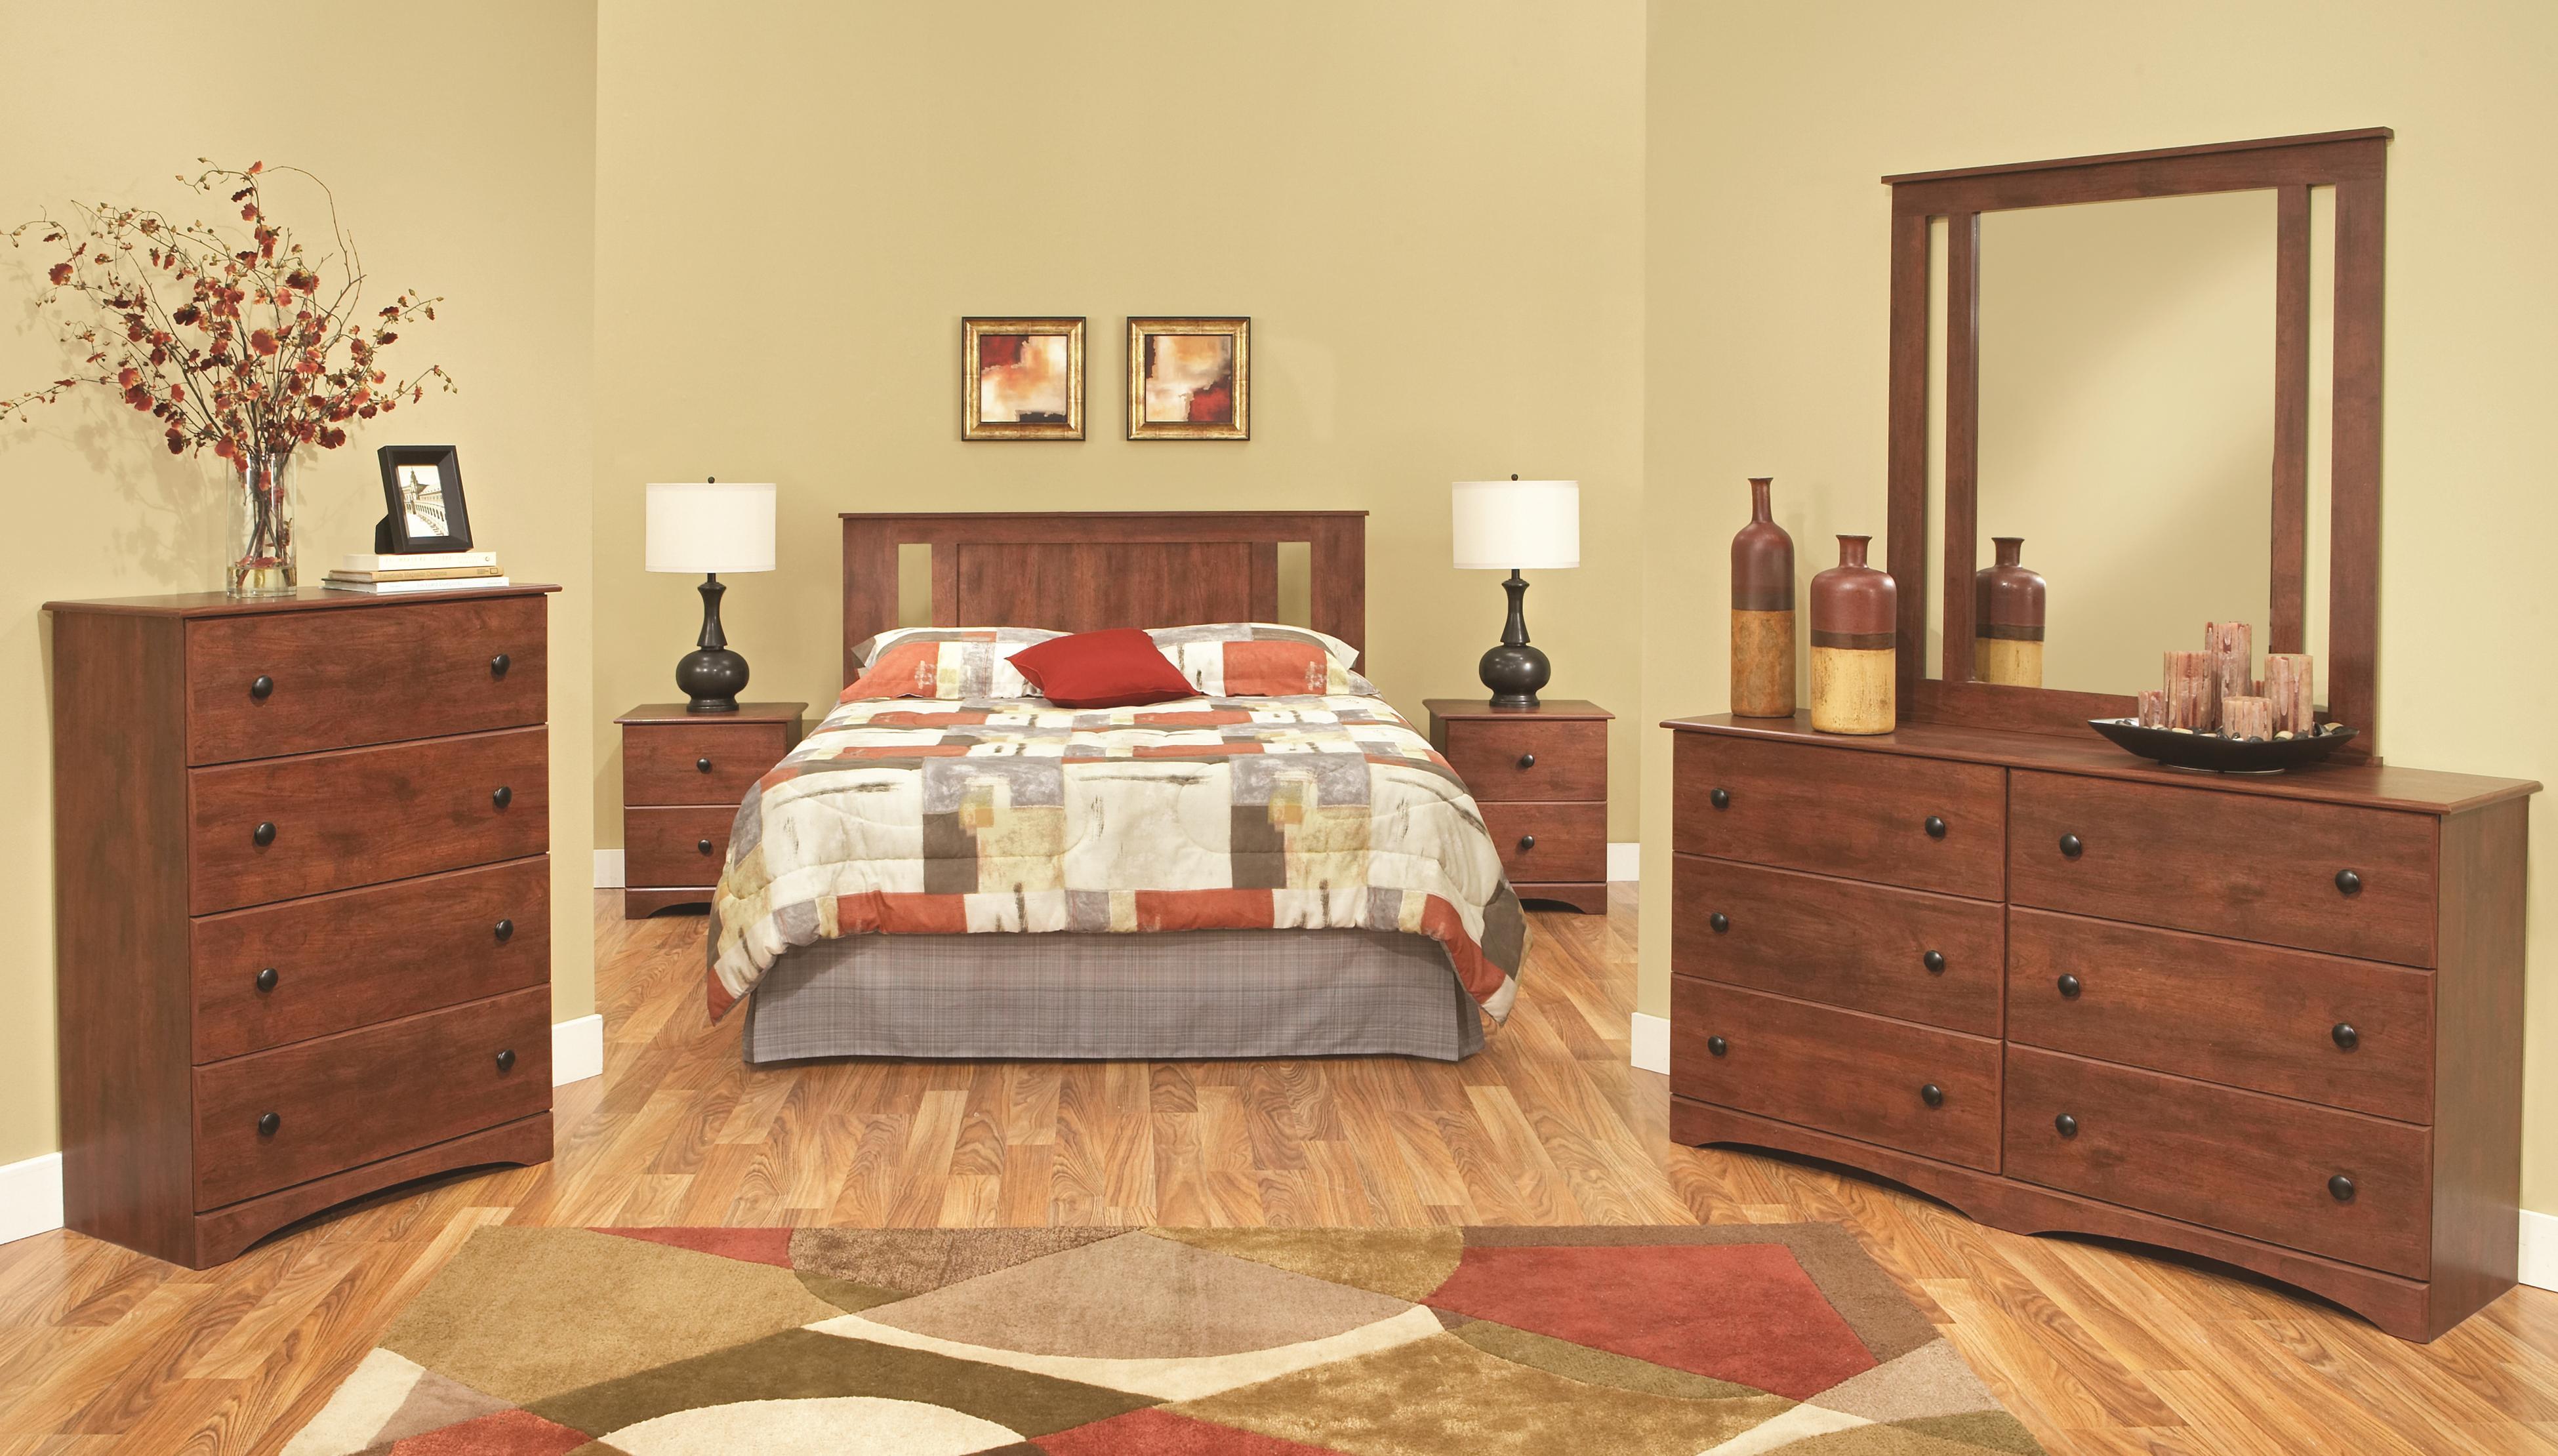 National Warehouse Furniture Buffalo Ny 14212 Pennysaverusa